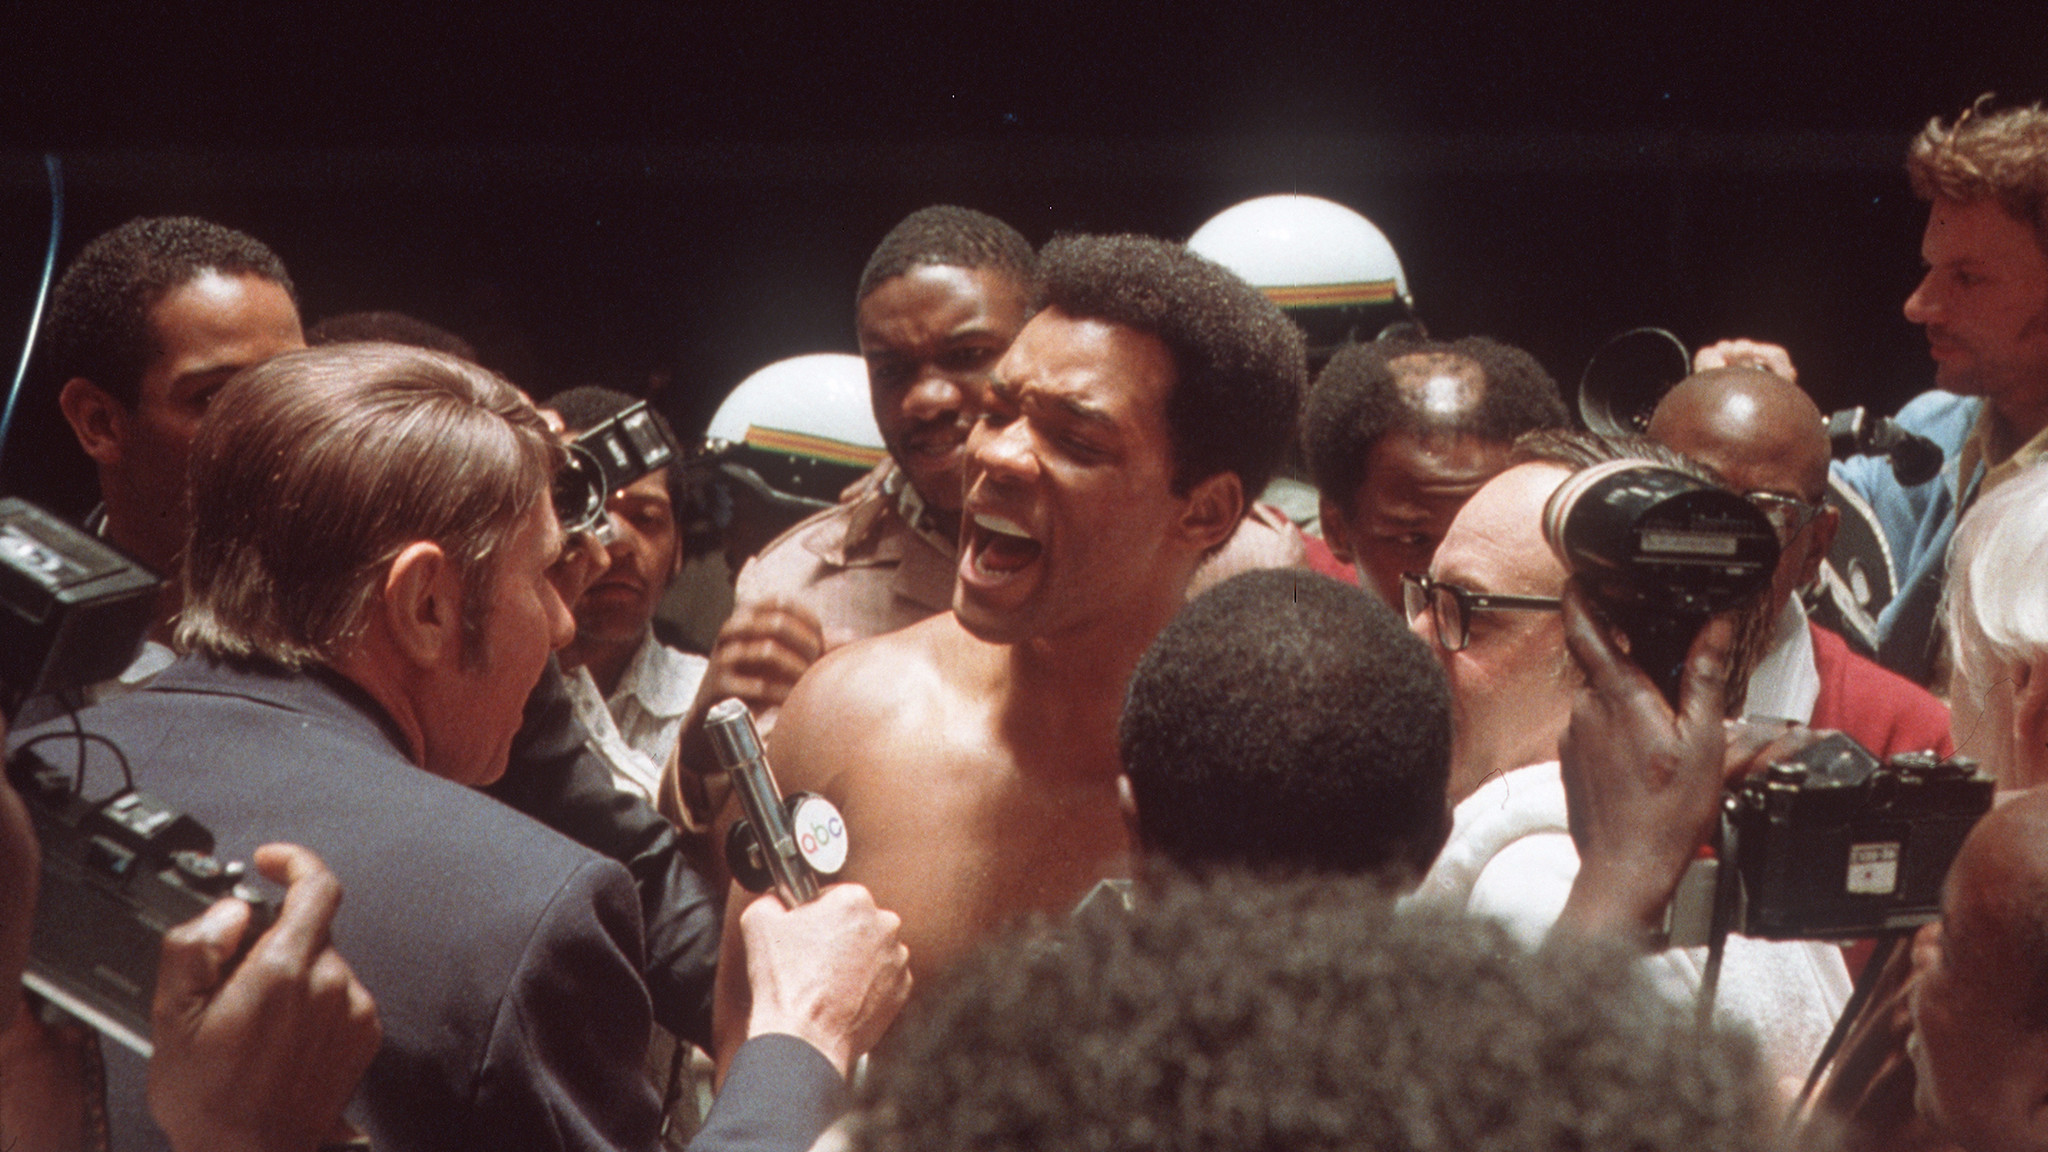 Will Smith, center, as Muhammad Ali in